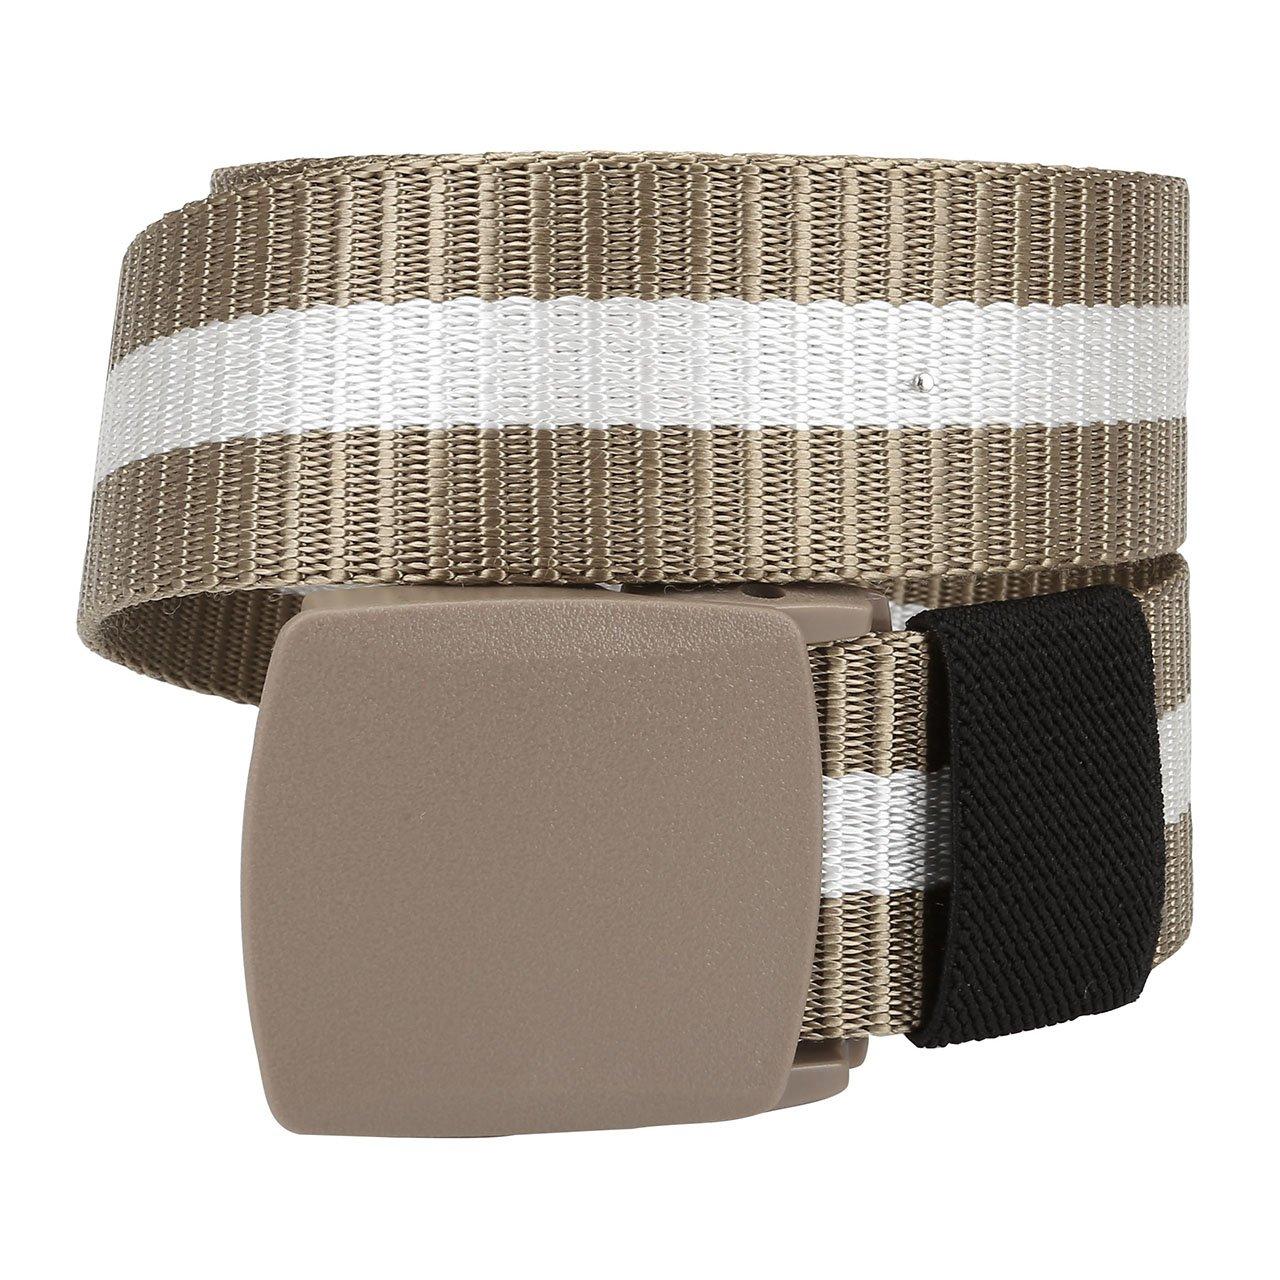 Ayliss Mens Military Webbing Nylon Belt Hypoallergenic Plastic Automatic Buckle,Beige Stripes